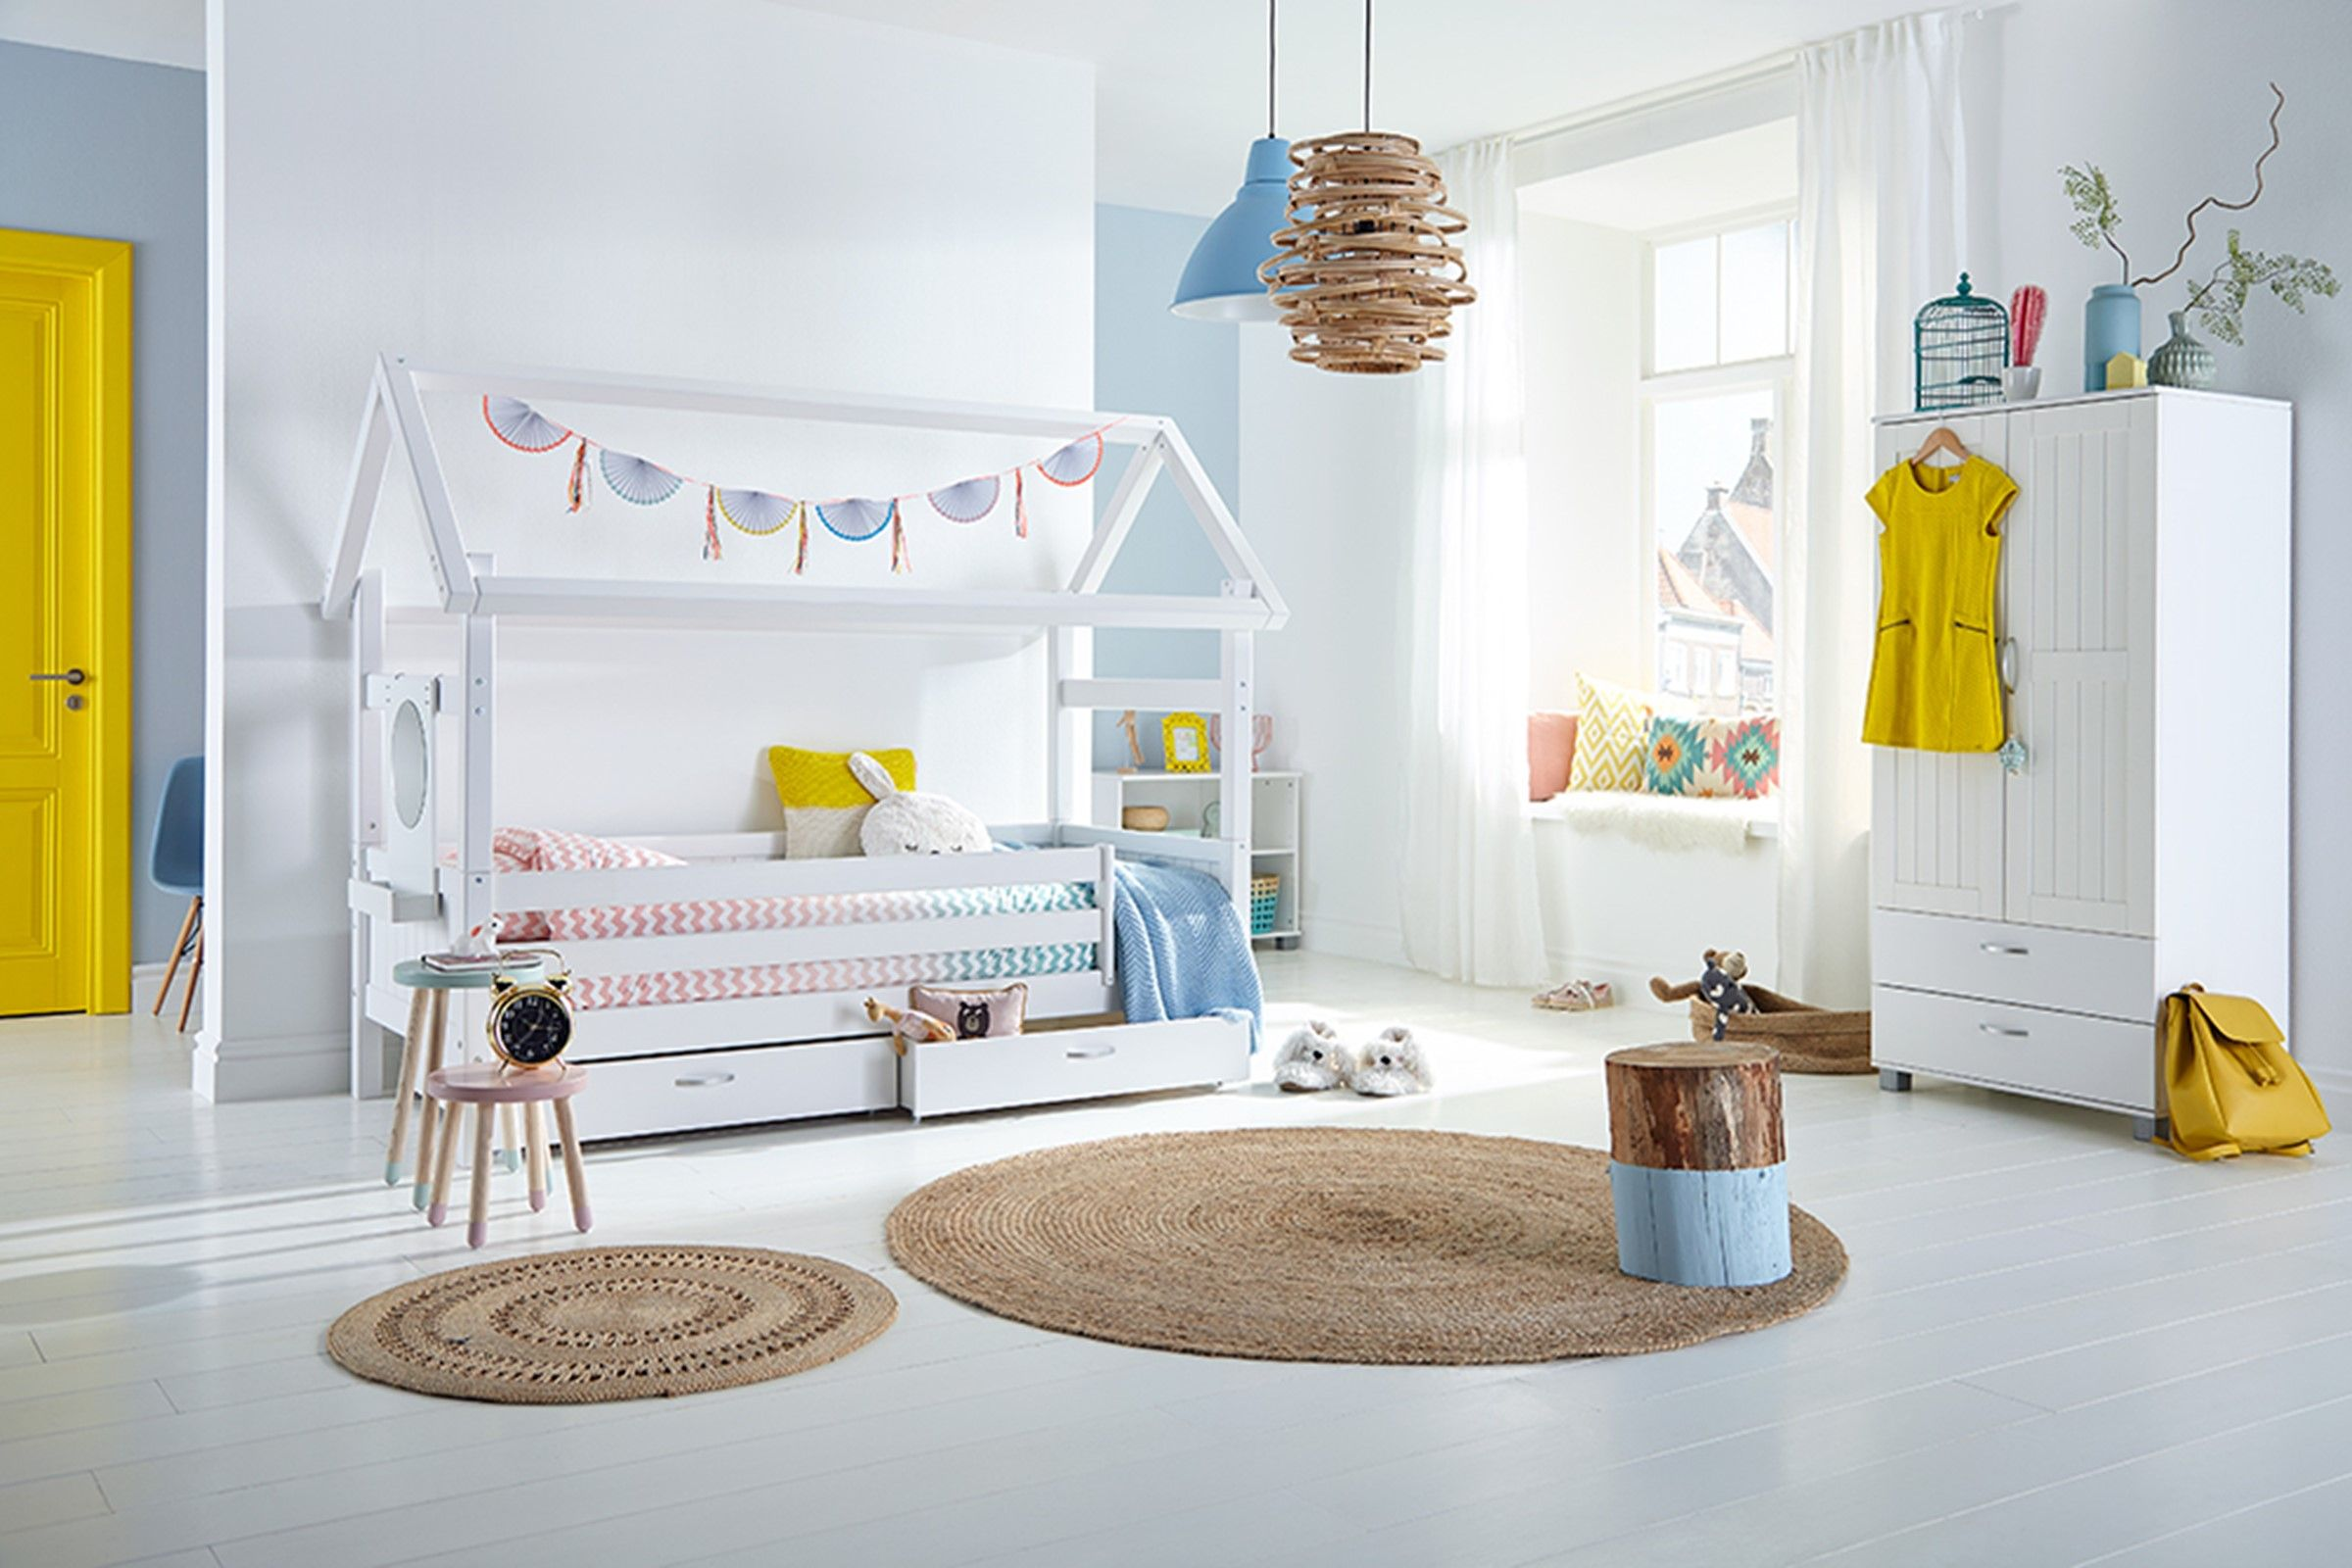 Halfhoogslaper Beter Bed.Sofabed Puck In 2019 Kinderkamer Woonboulevard Breda Xxl Sofa